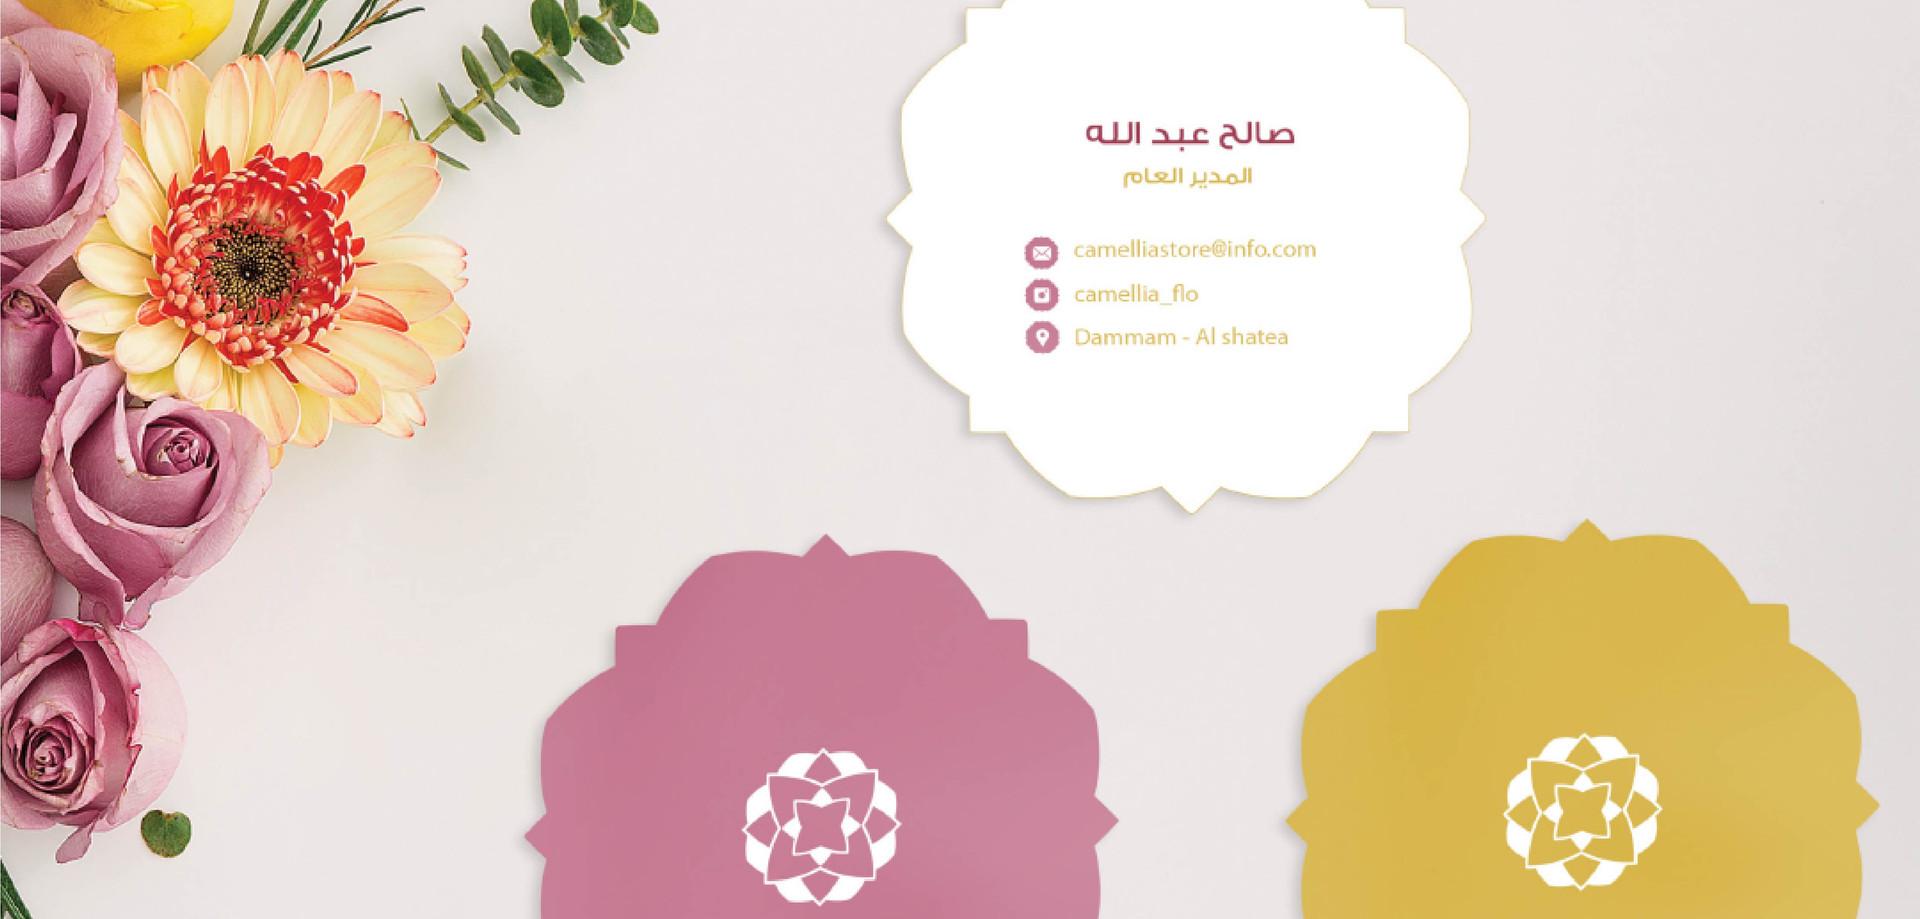 Camellia - L1.jpg